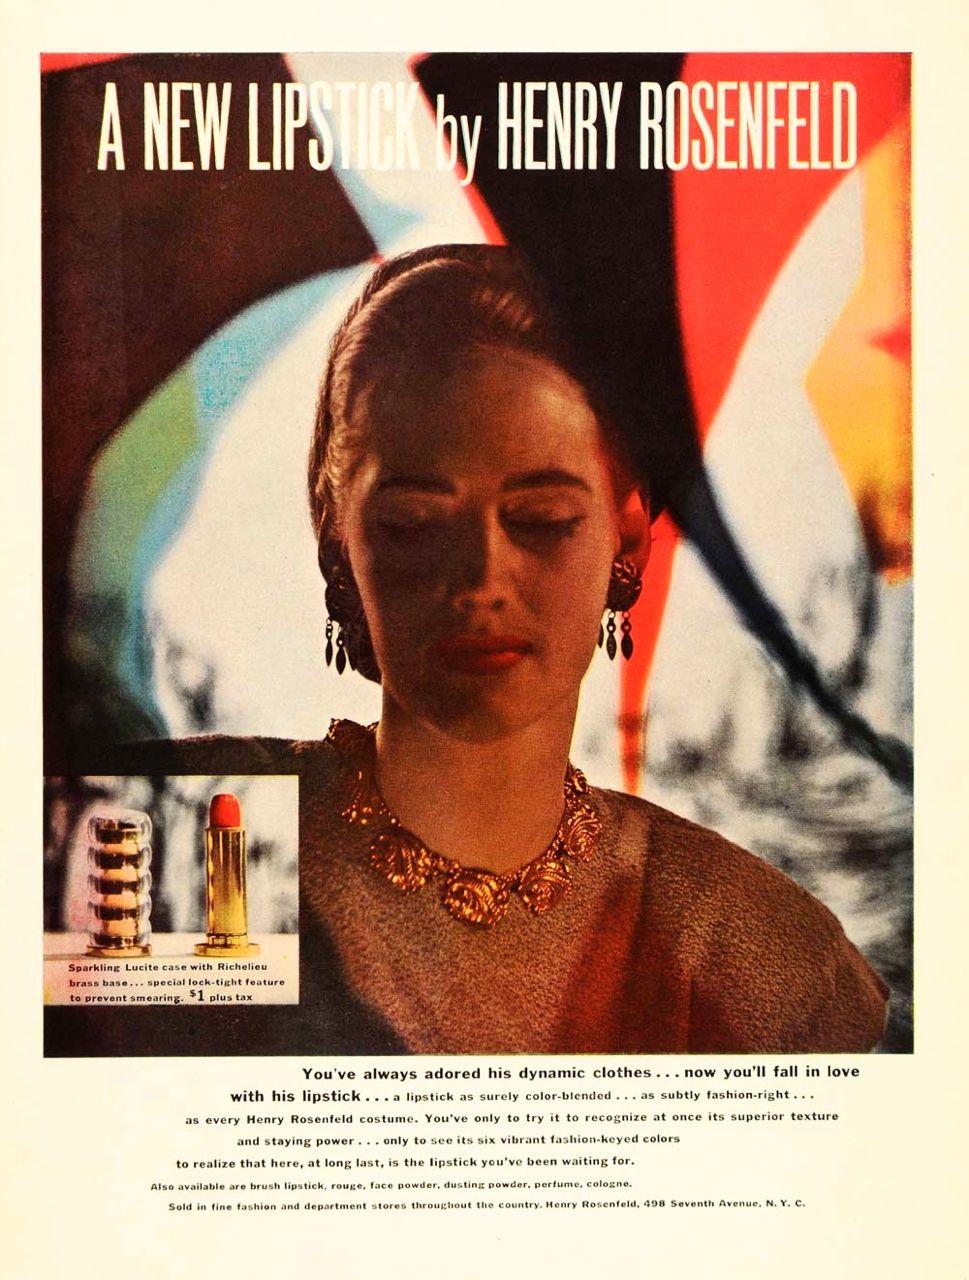 Henry Rosenfeld Lipstick Ad 1940 S Vintage Fashion Vintage